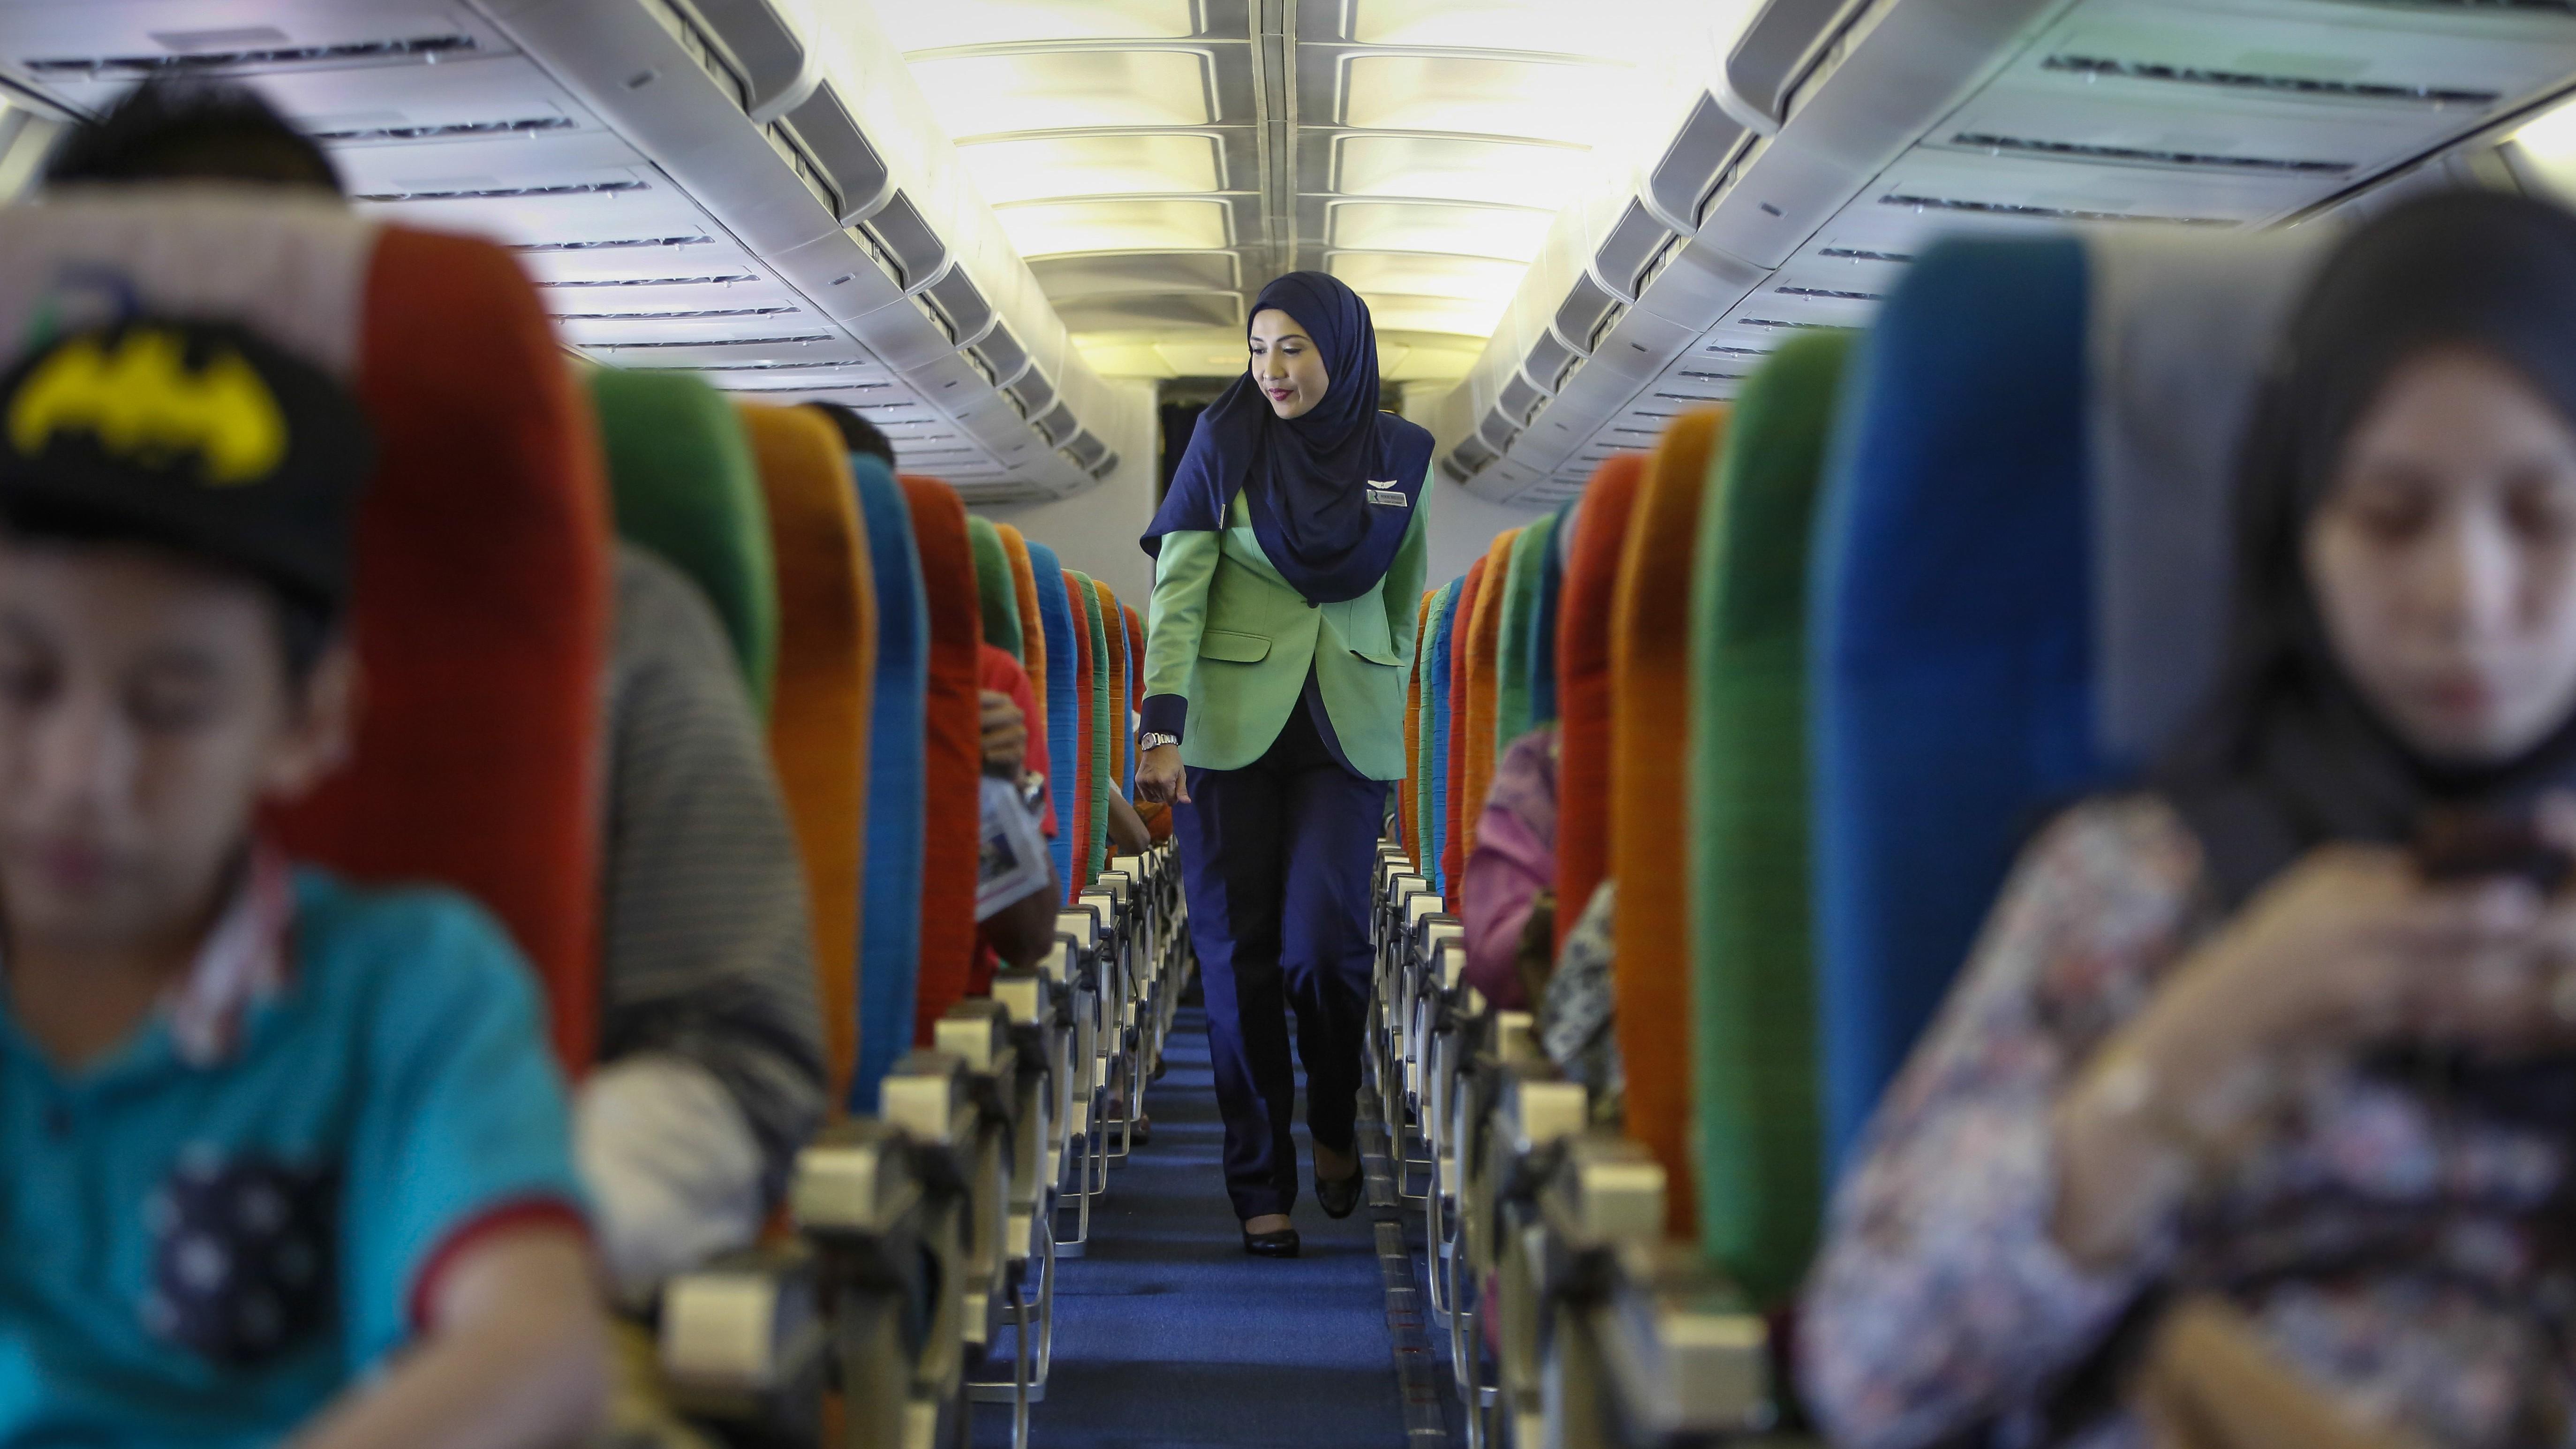 A Rayani Air flight attendant walks down the aisle on board before departure at Kuala Lumpur International Airport